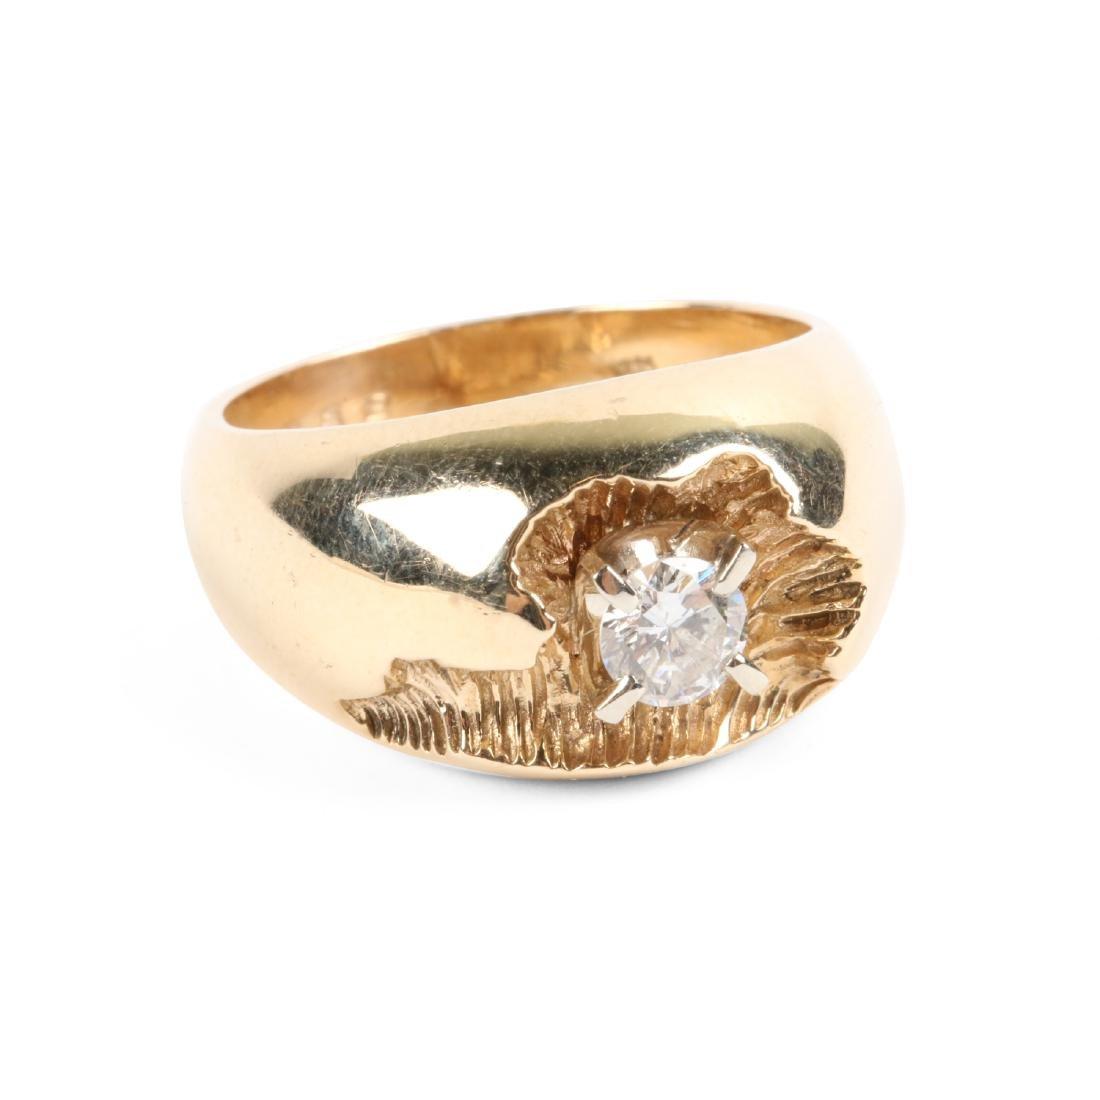 A 10-14k Gold & Diamond Ring